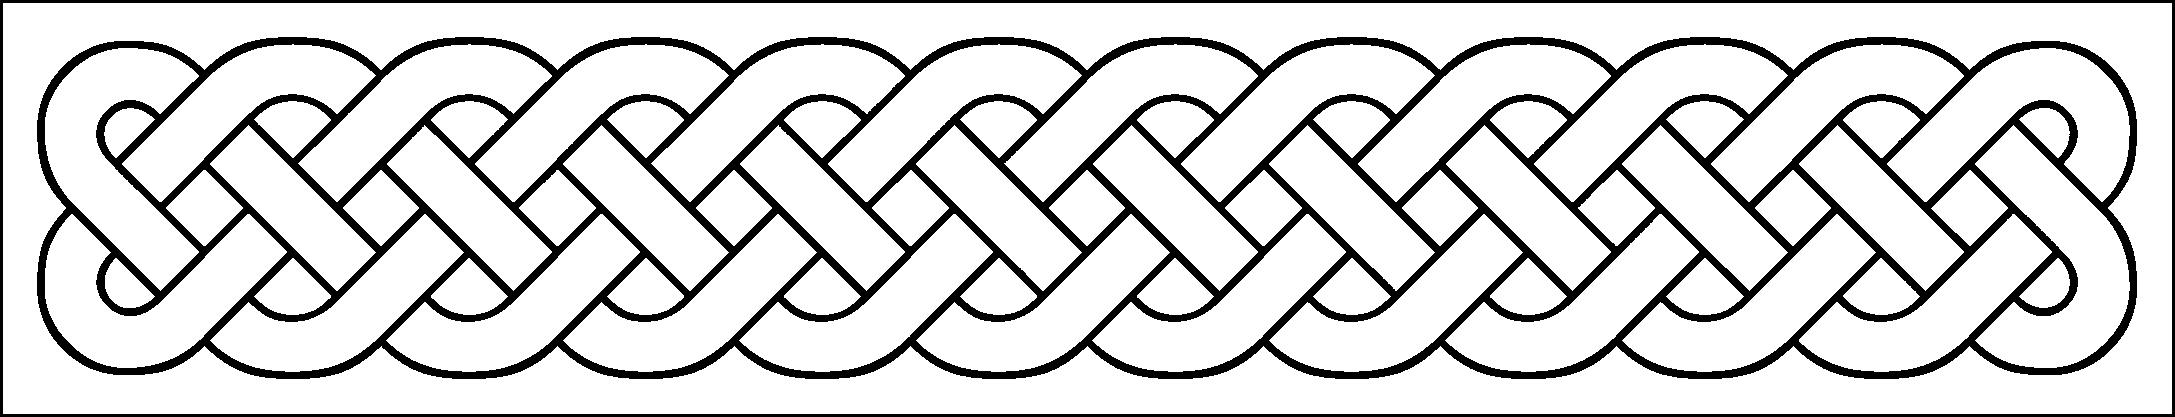 Celtic Braid Tattoo Designs